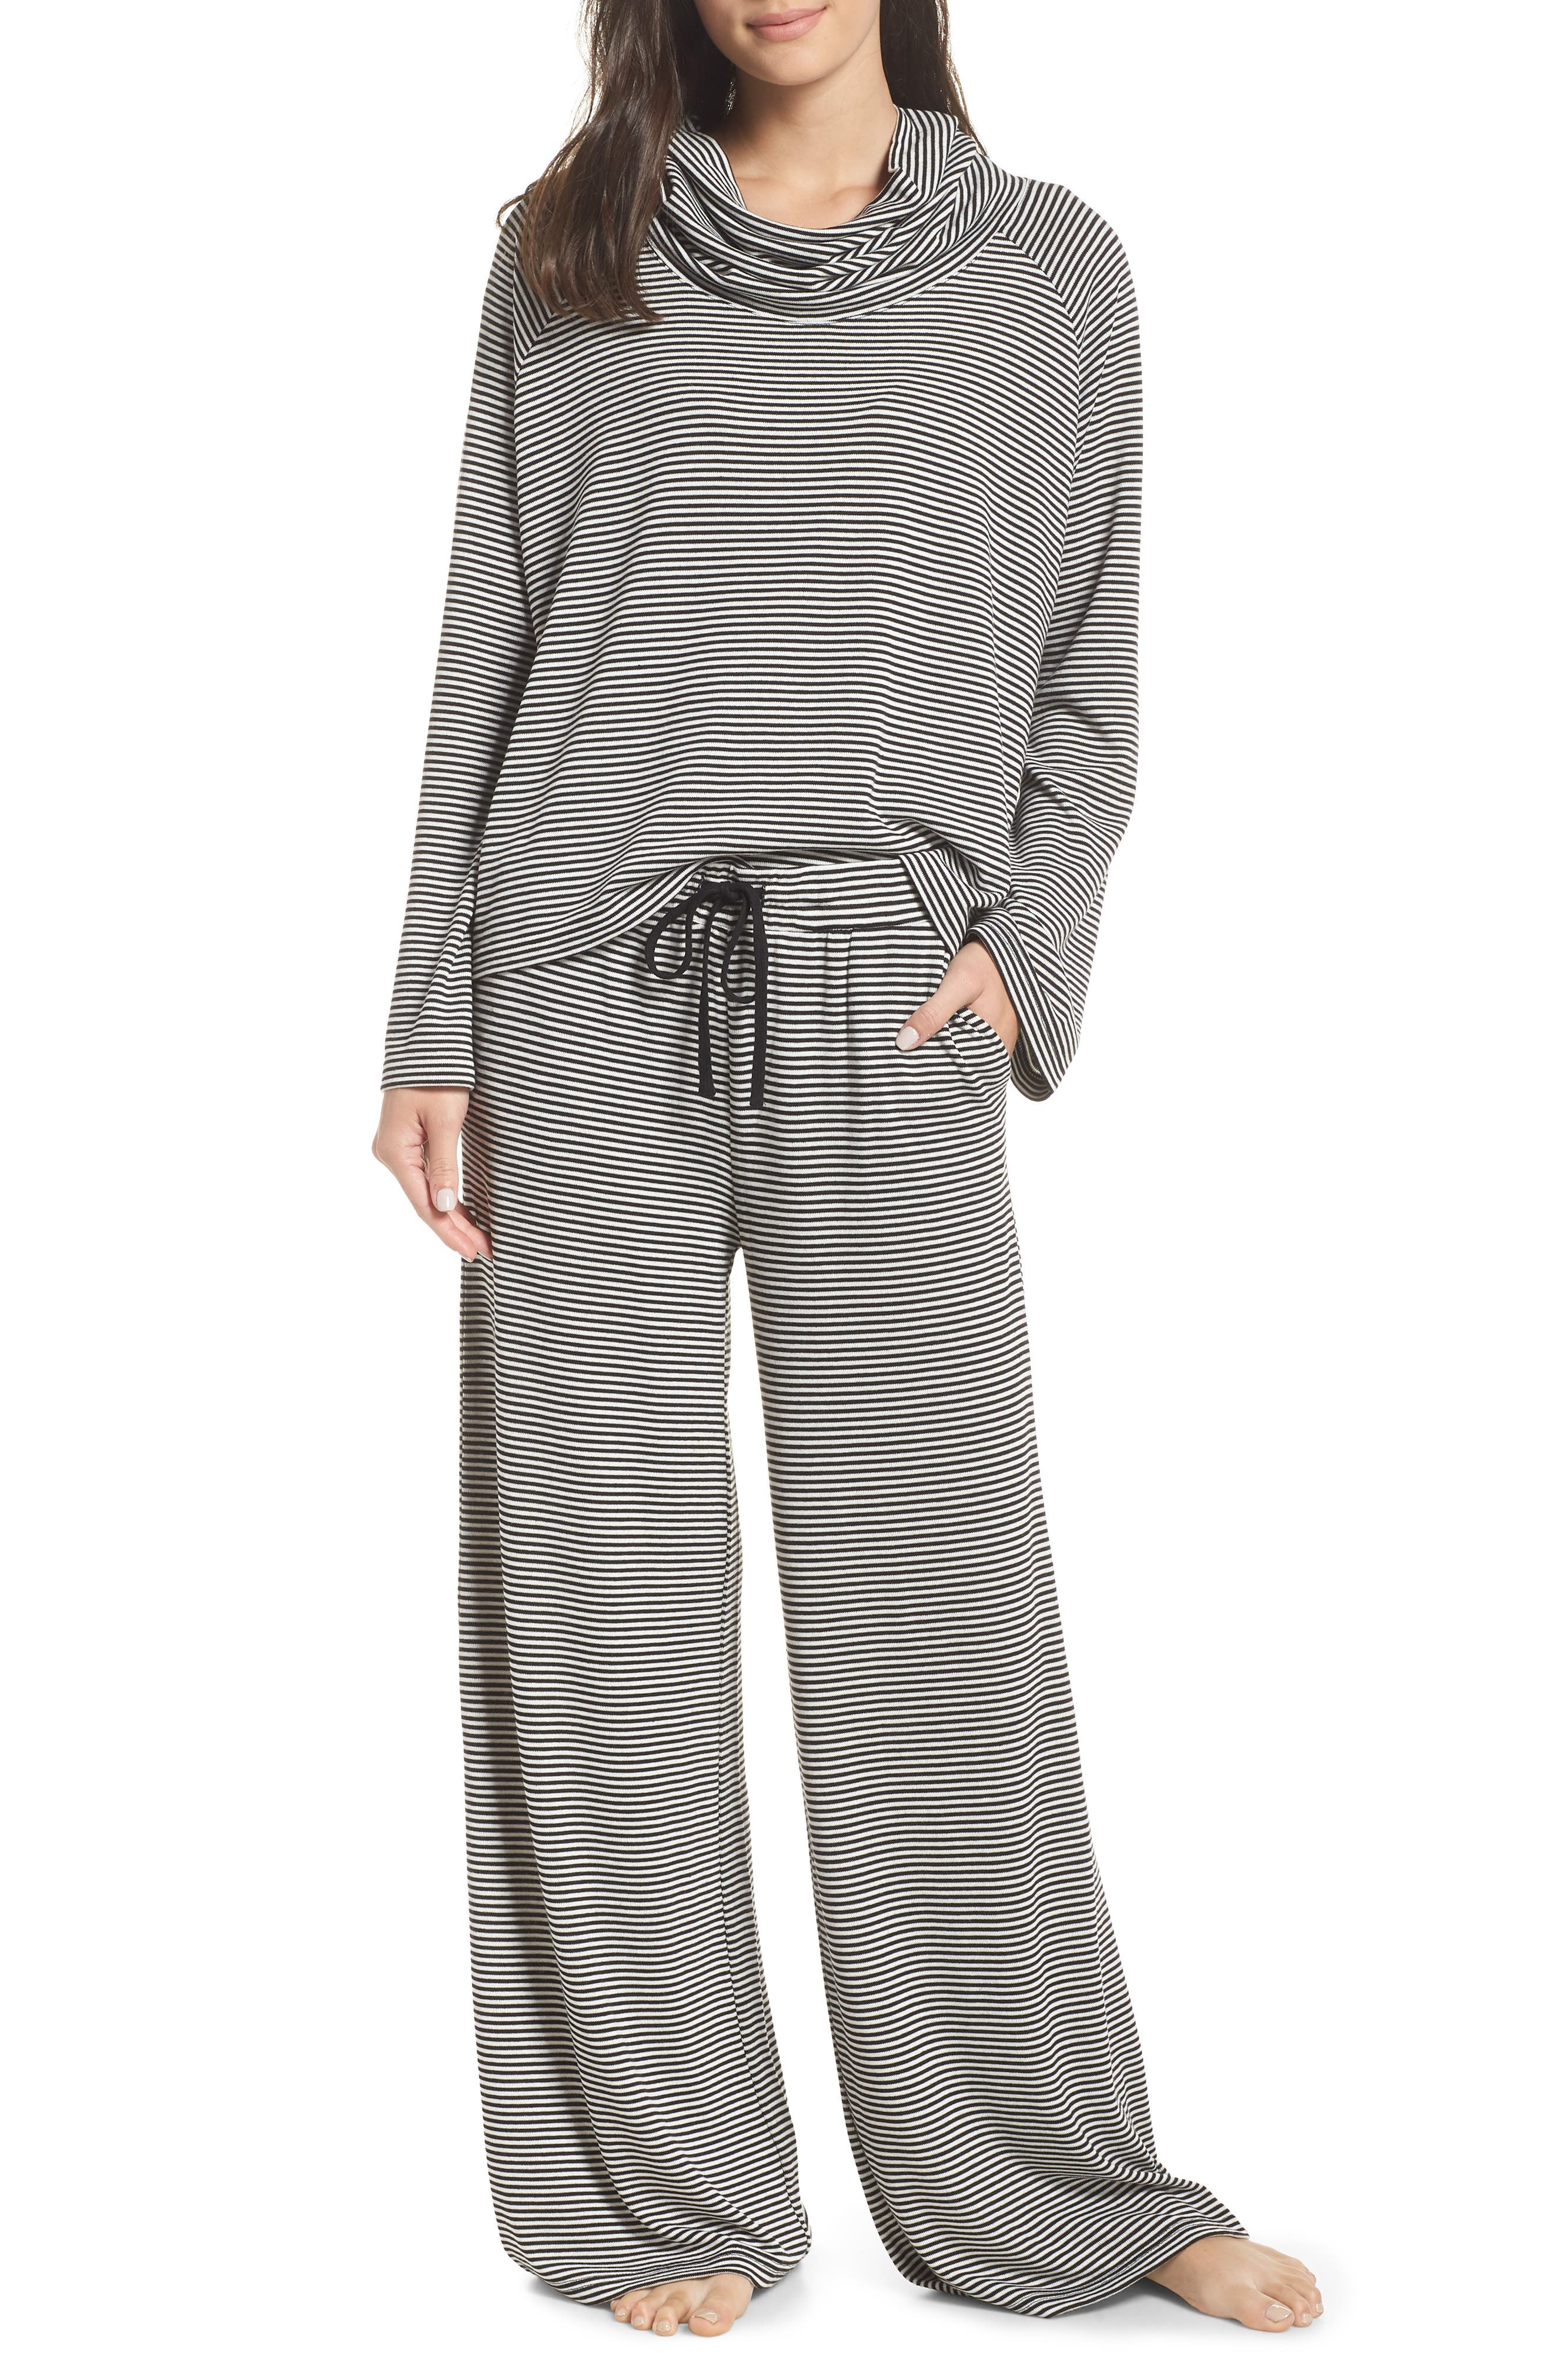 Dreams Wide Leg Pajama Pants,                             Alternate thumbnail 7, color,                             BLACK